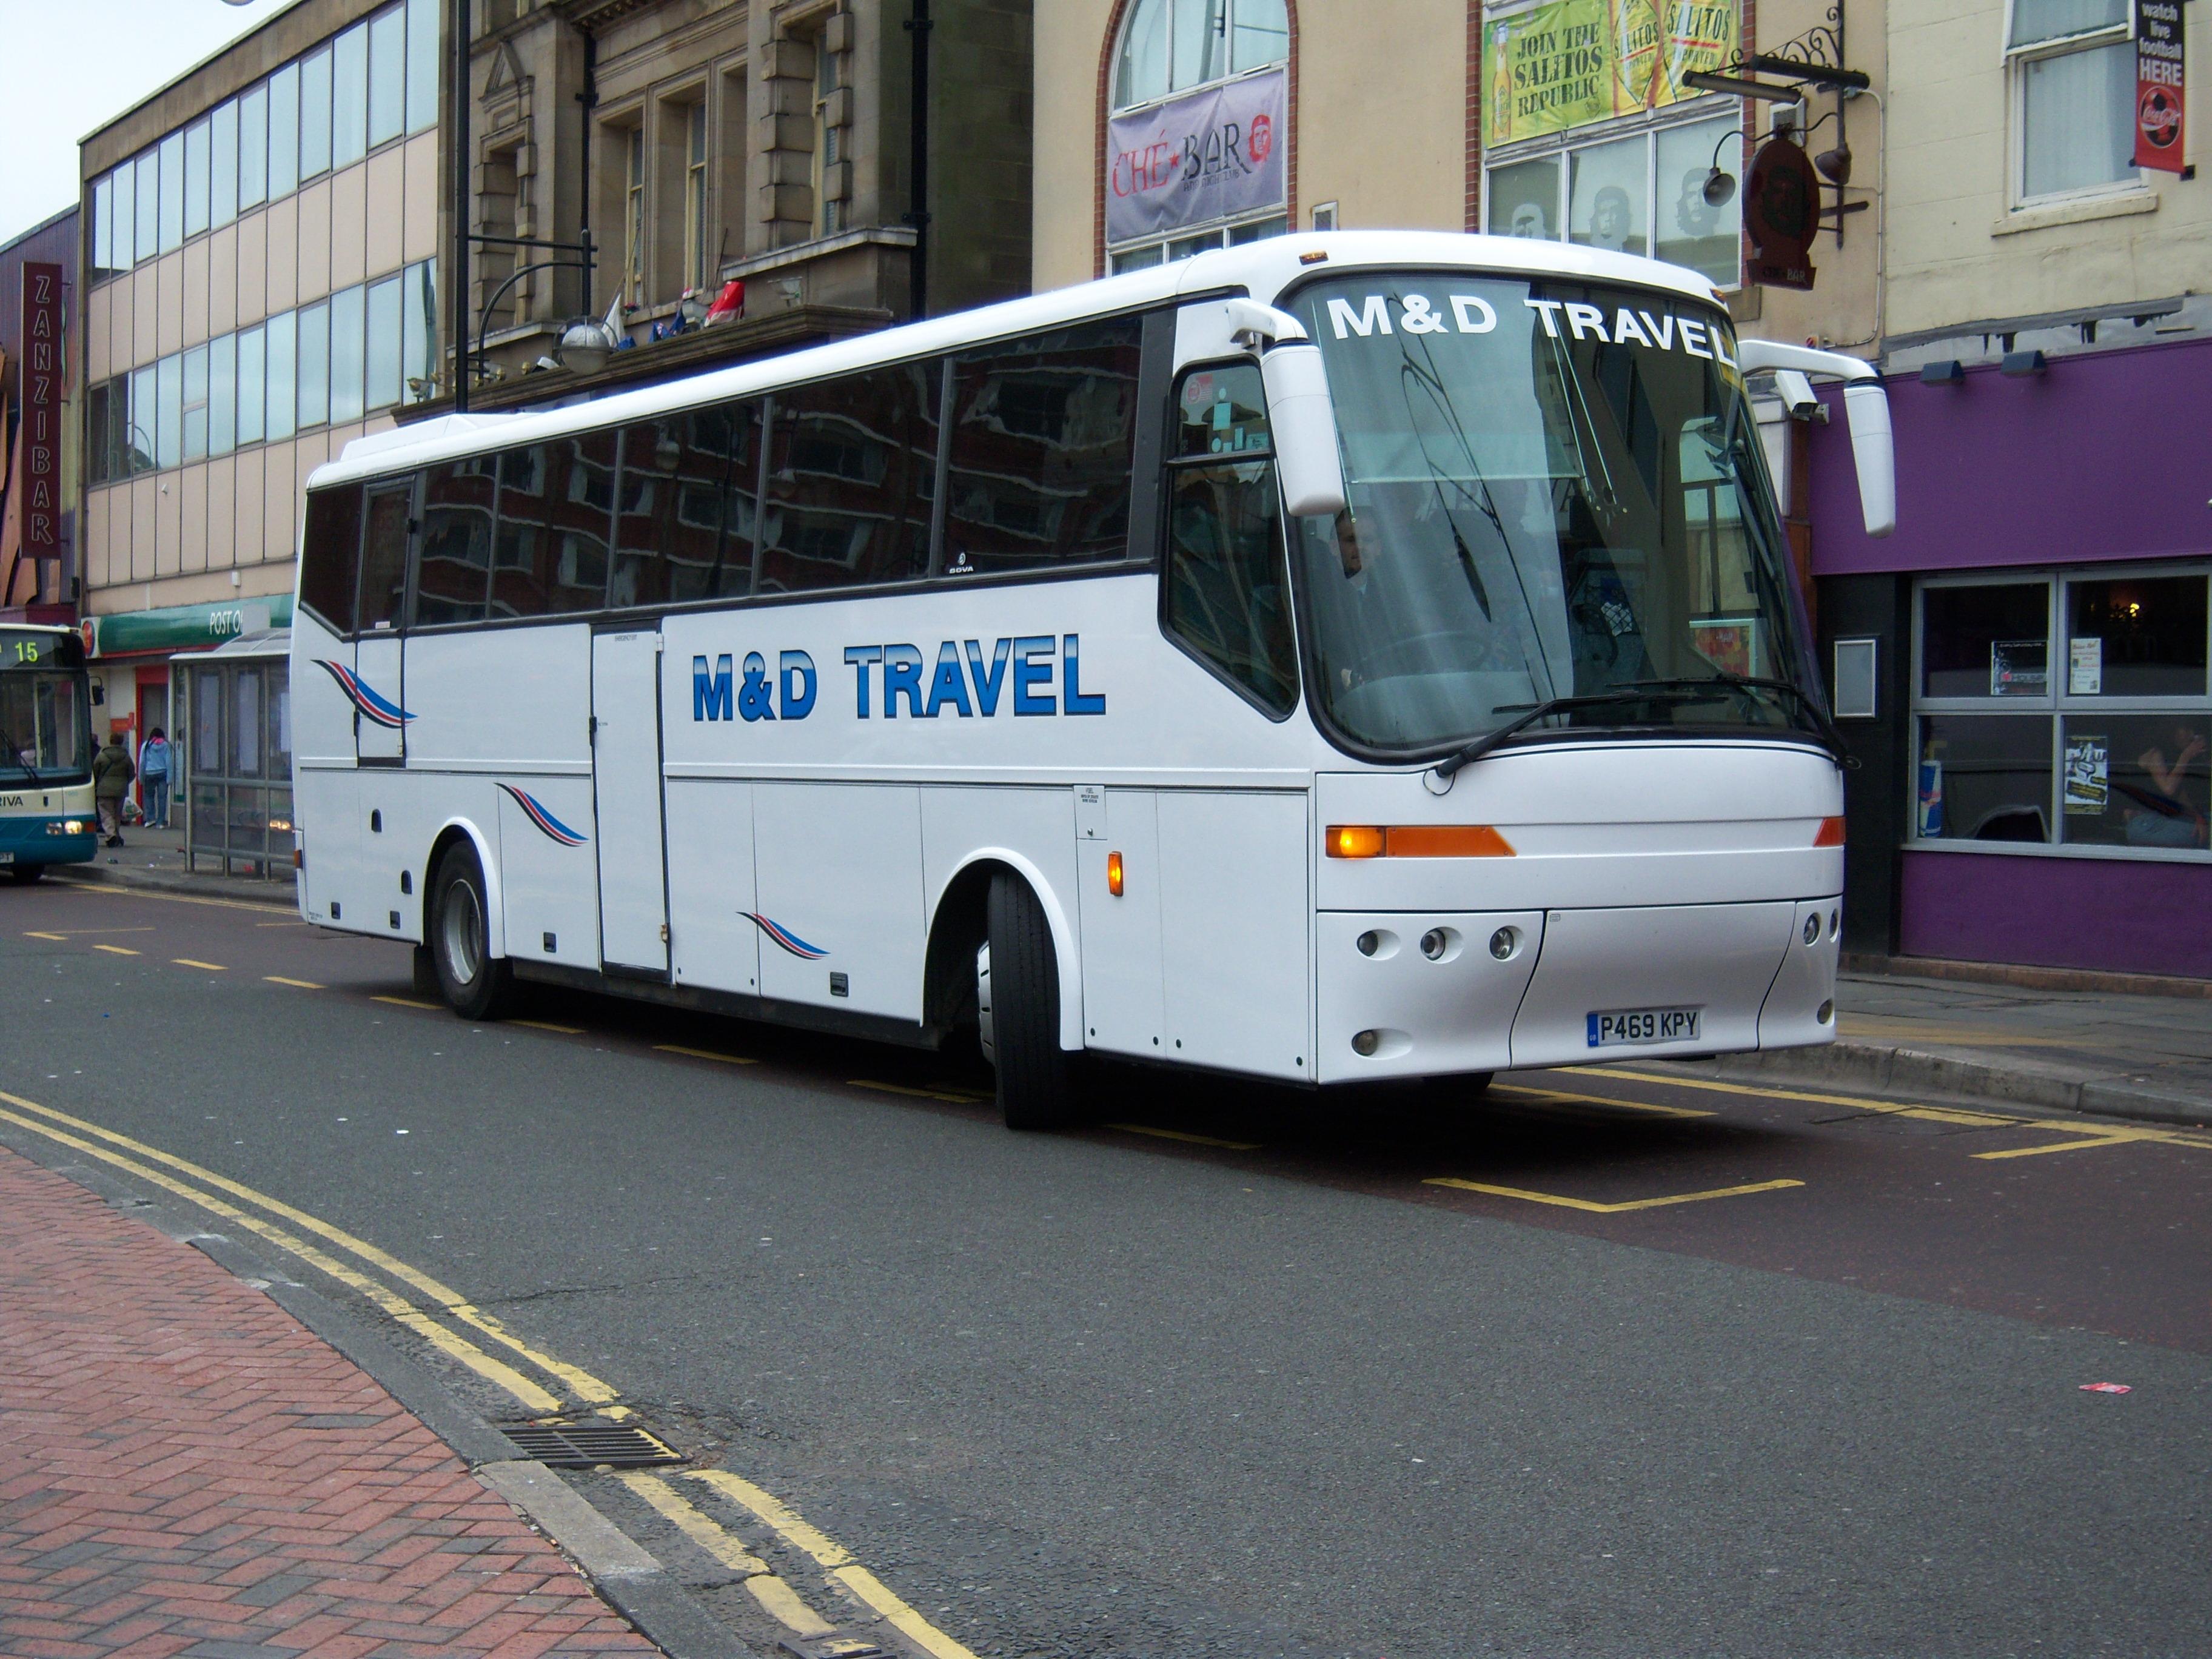 File:M&D Travel coach P469 KPY Bova Futura in Stockton 5 May 2009 ...